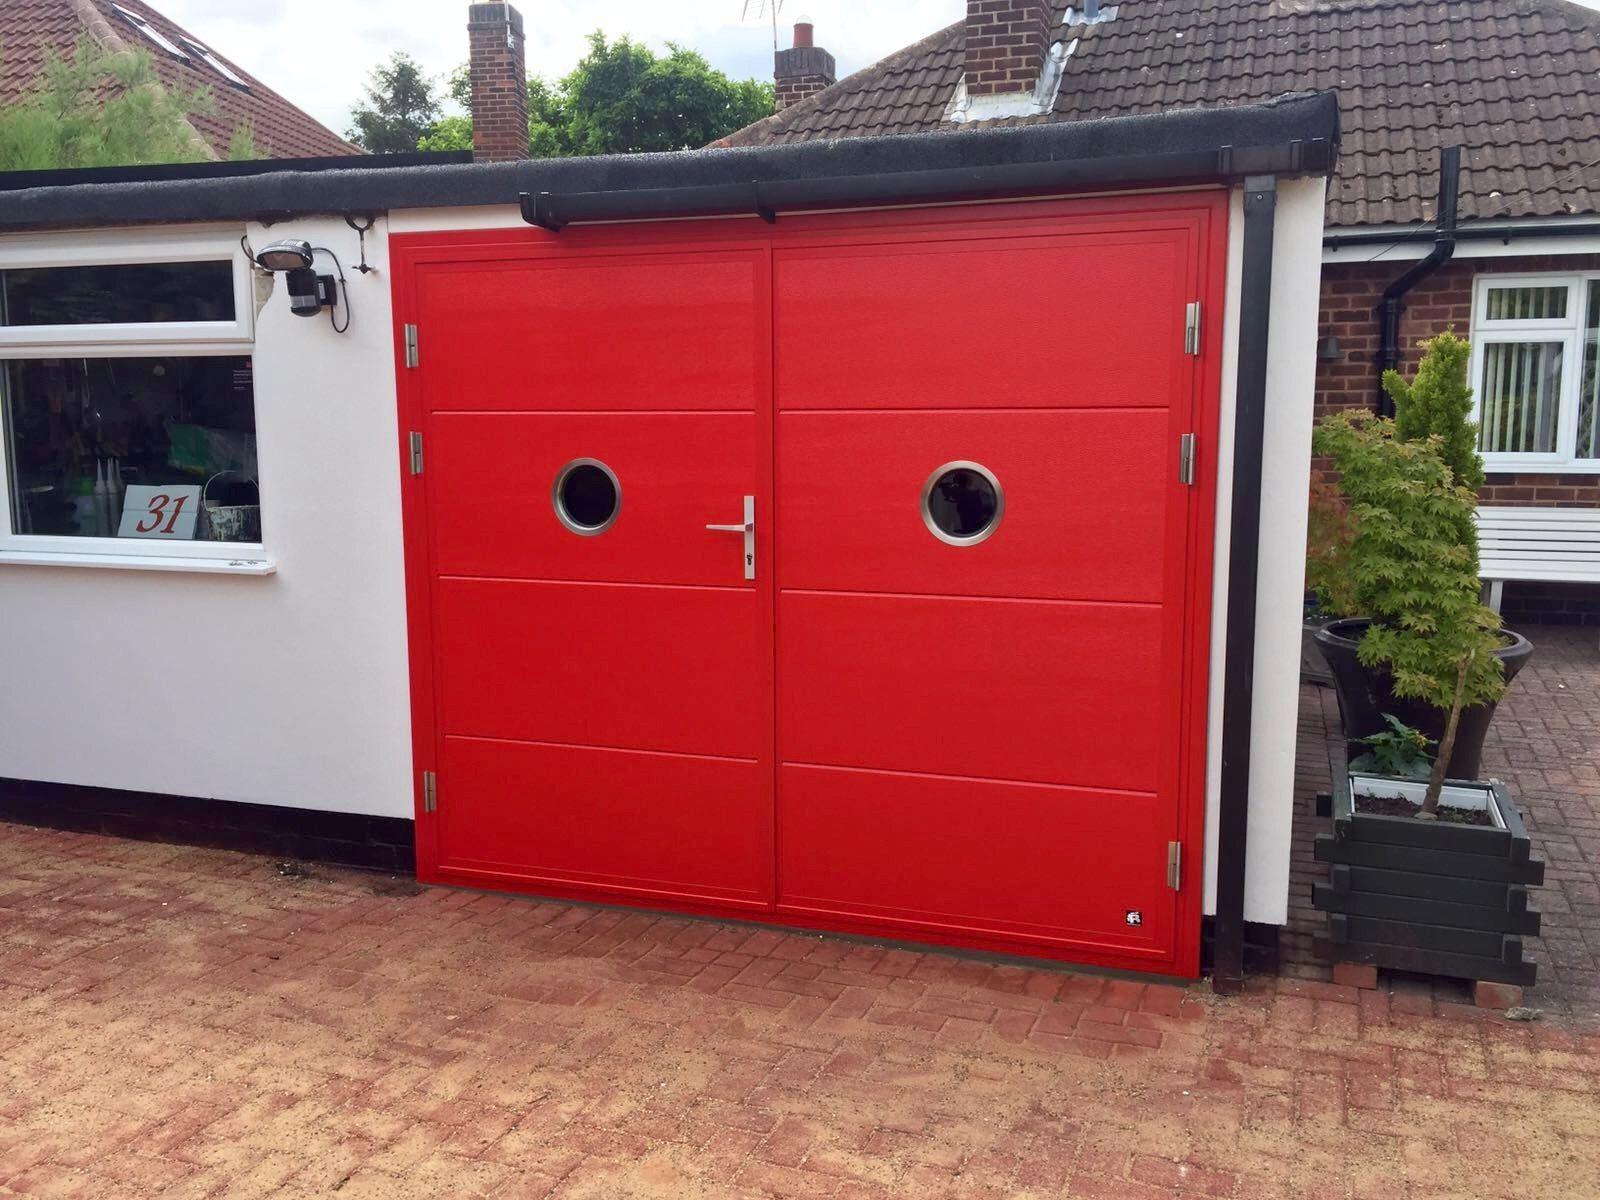 Ryterna Shd Flush Woodgrain Ral 3002 With X2 Circular Inox Windows Garage Door Insulation Garage Doors Sectional Garage Doors